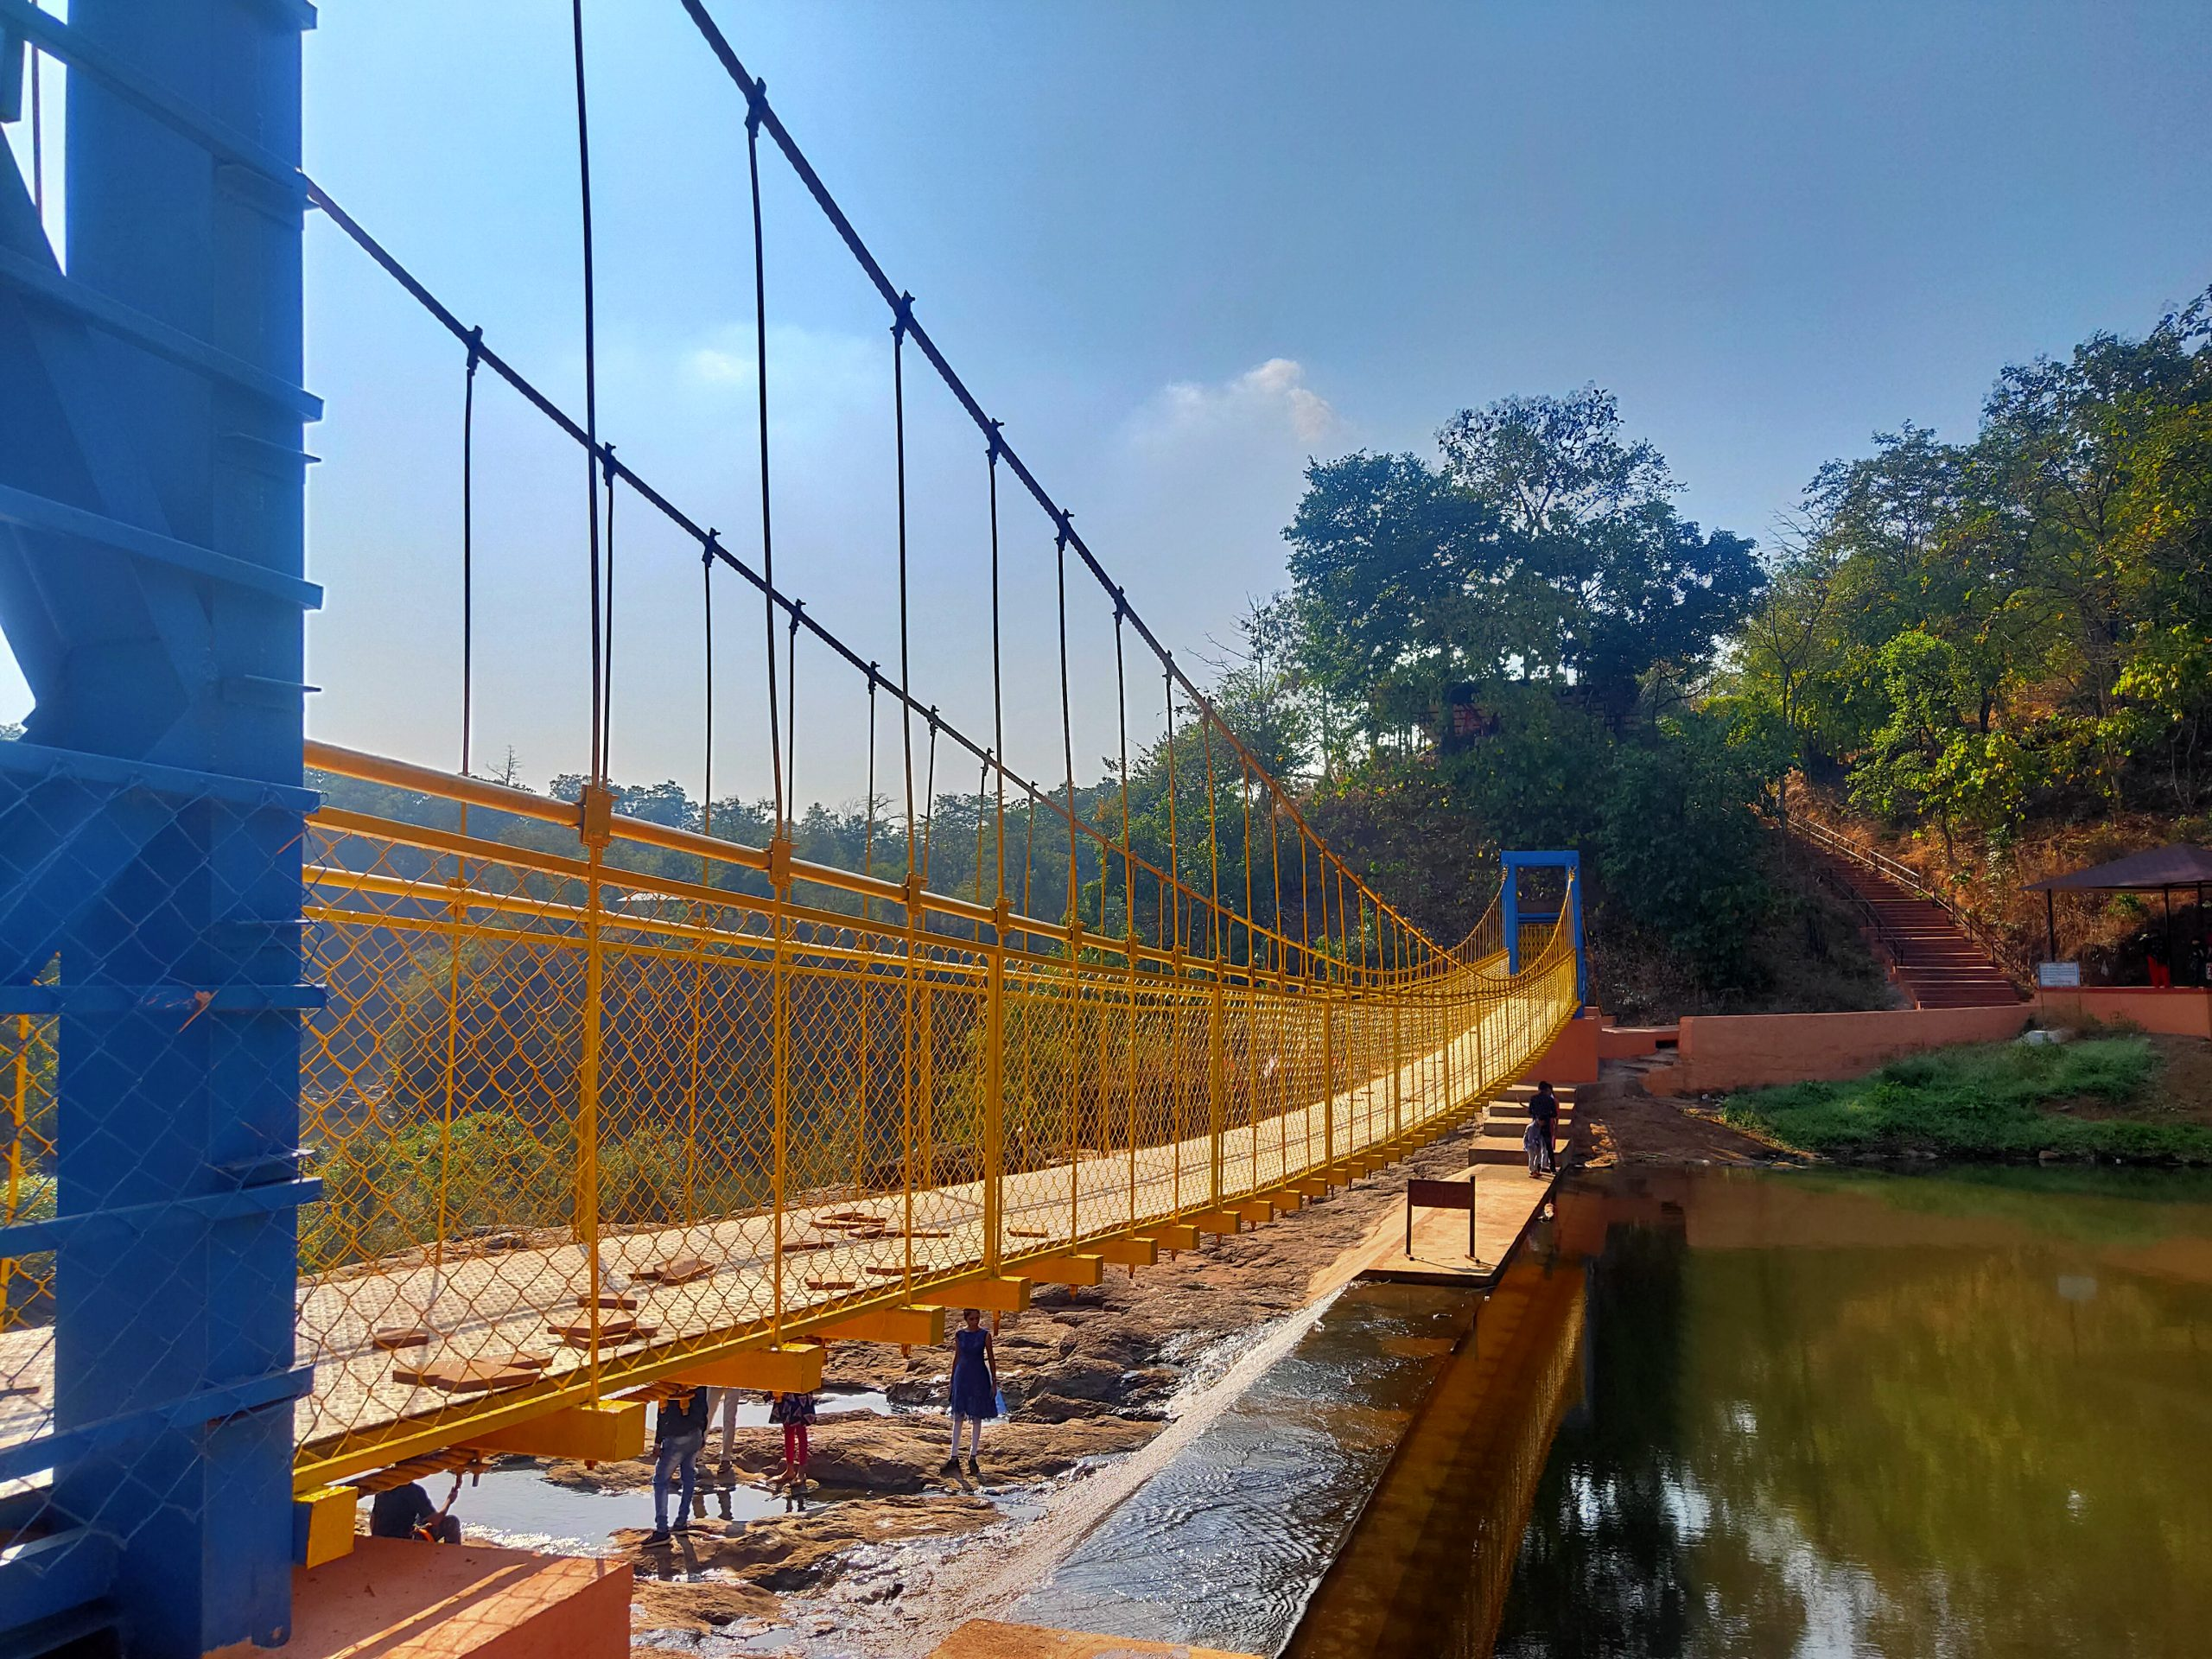 bridge with water underneath